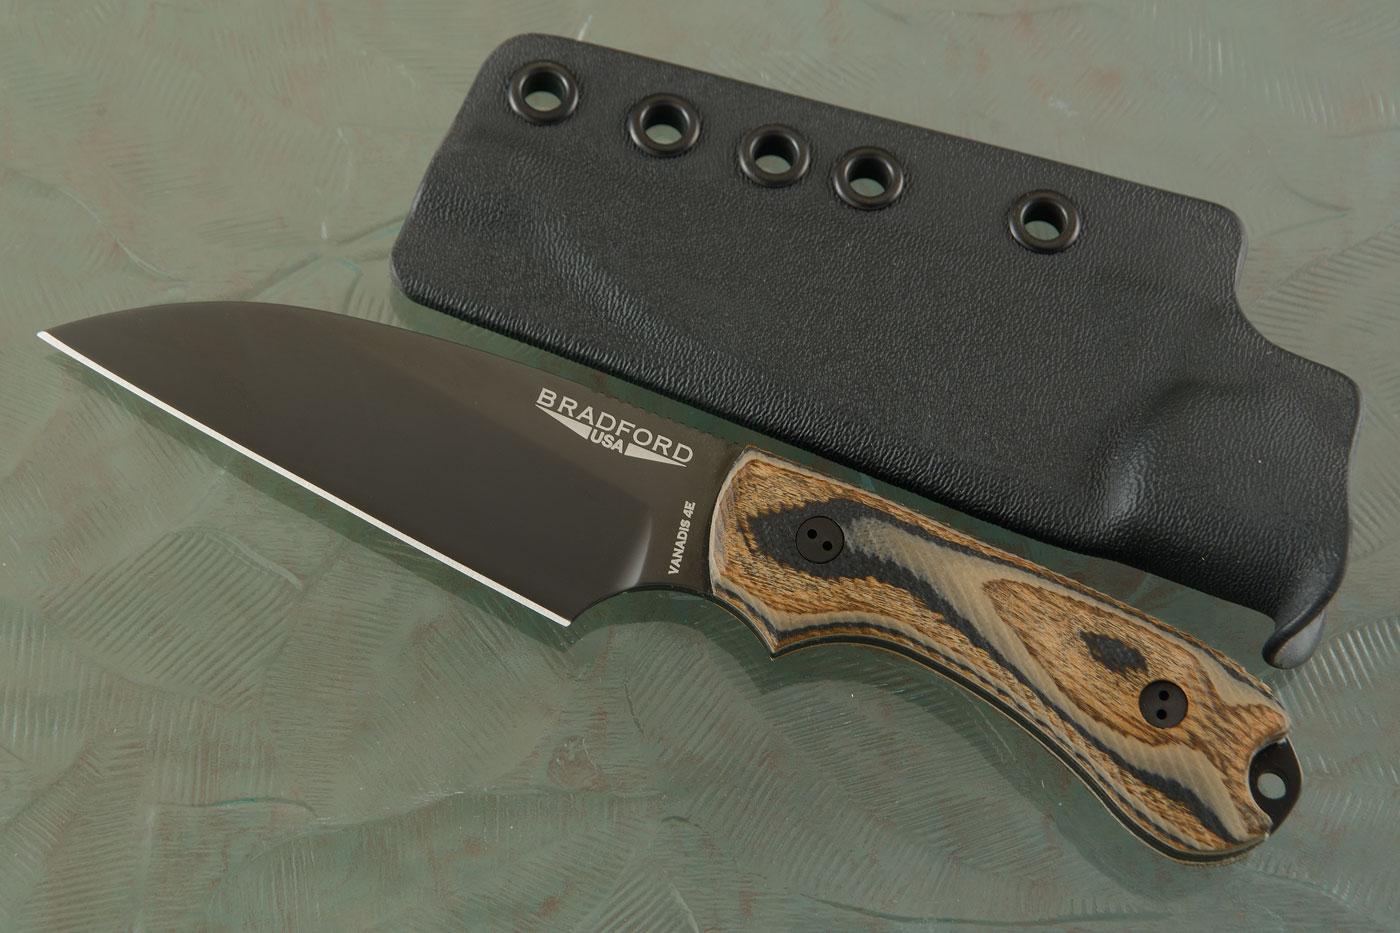 Guardian 3 - 3D G-Wood, Vanadis 4E, DLC Blade, Wharncliffe Grind